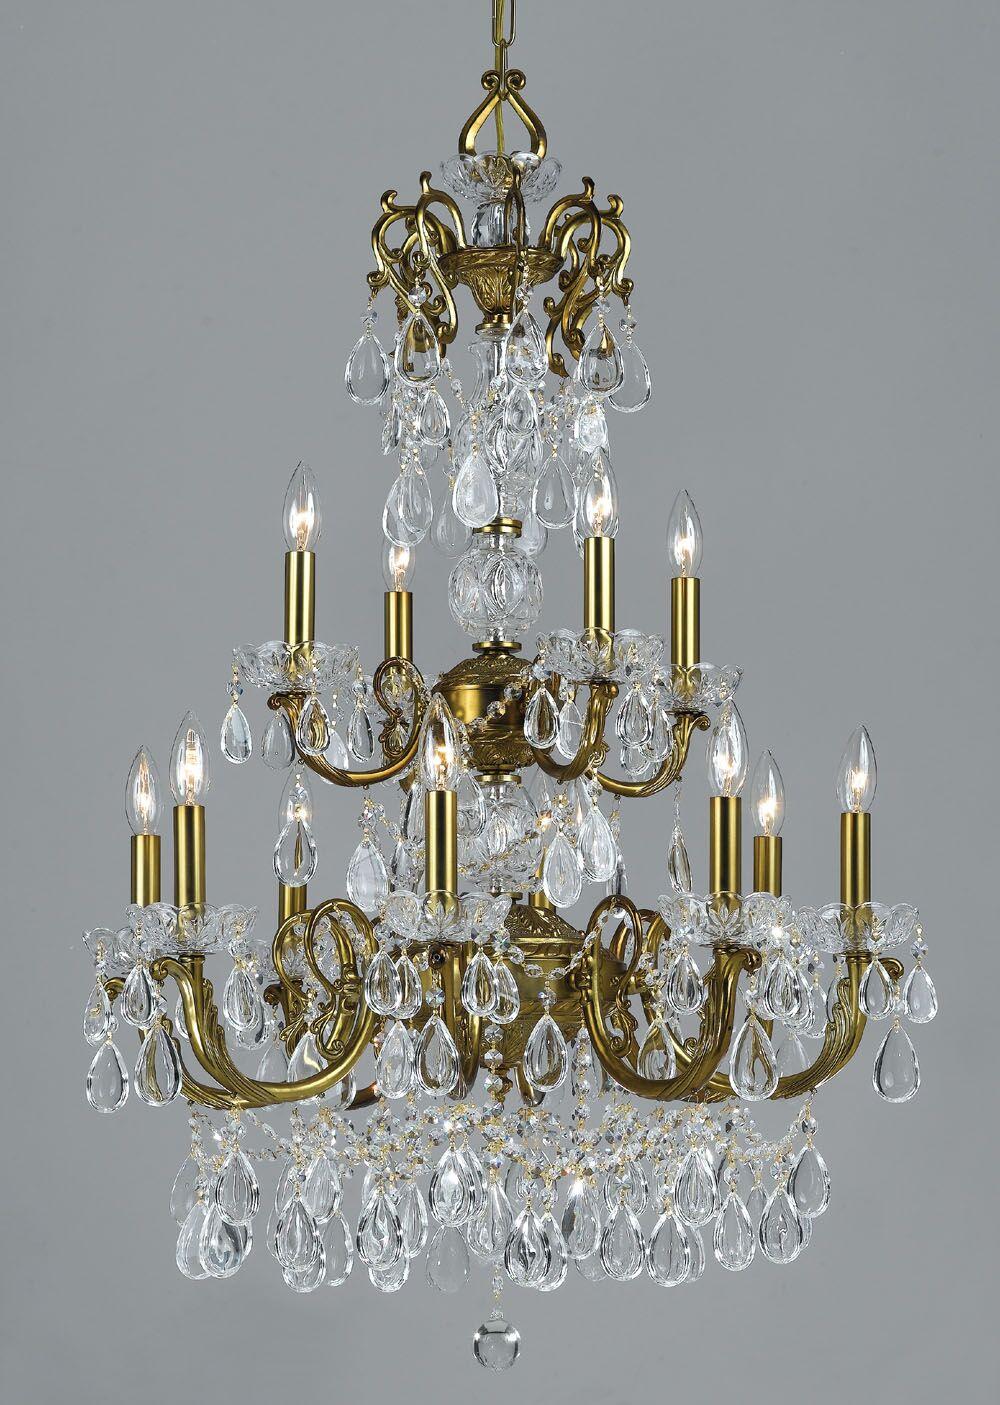 Vienna Palace 12-Light Candle Style Chandelier Finish: Renovation Brass